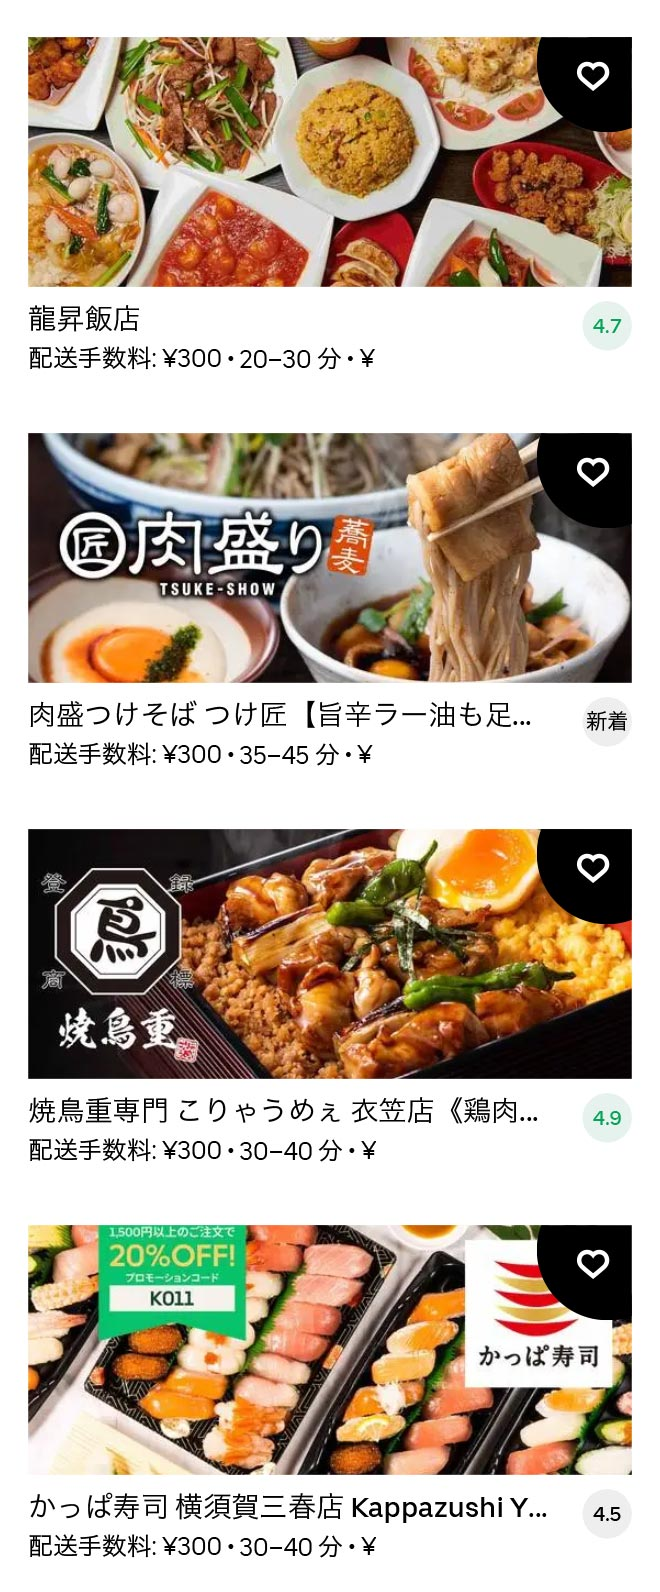 Yokosuka chuo menu 2011 12